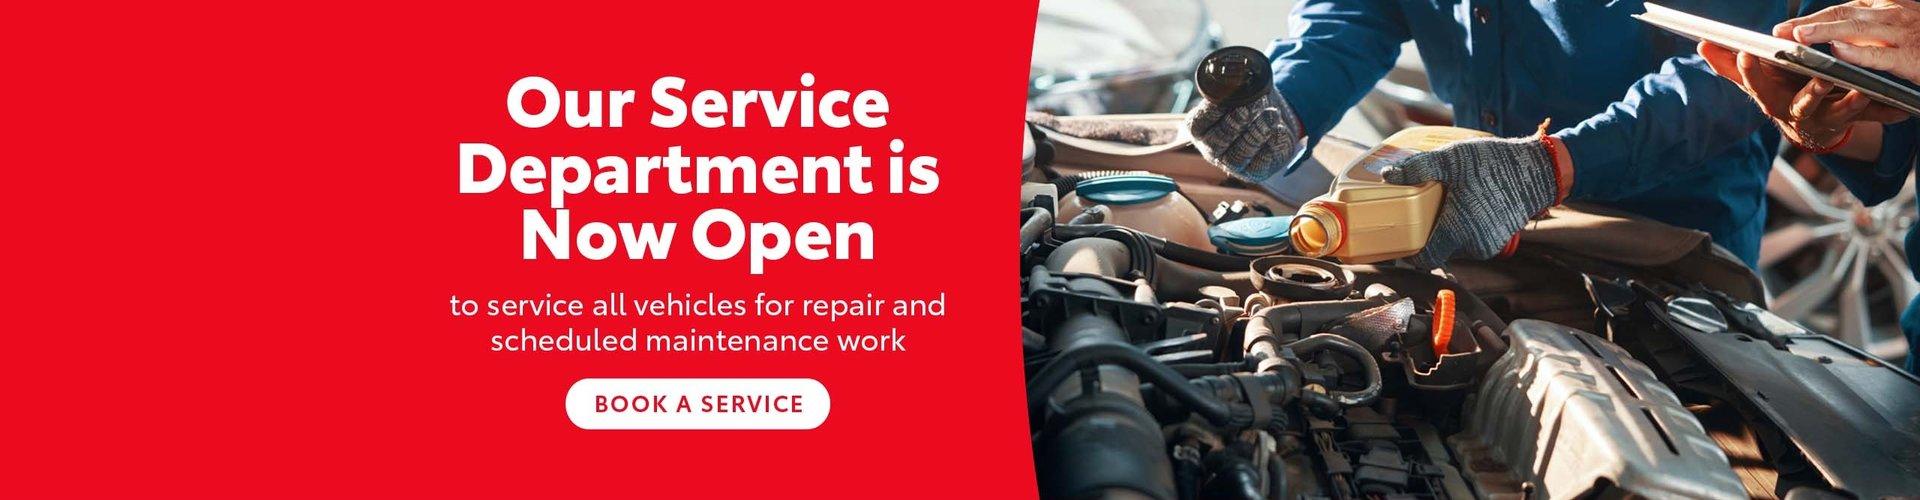 Croydon Toyota - Book a service